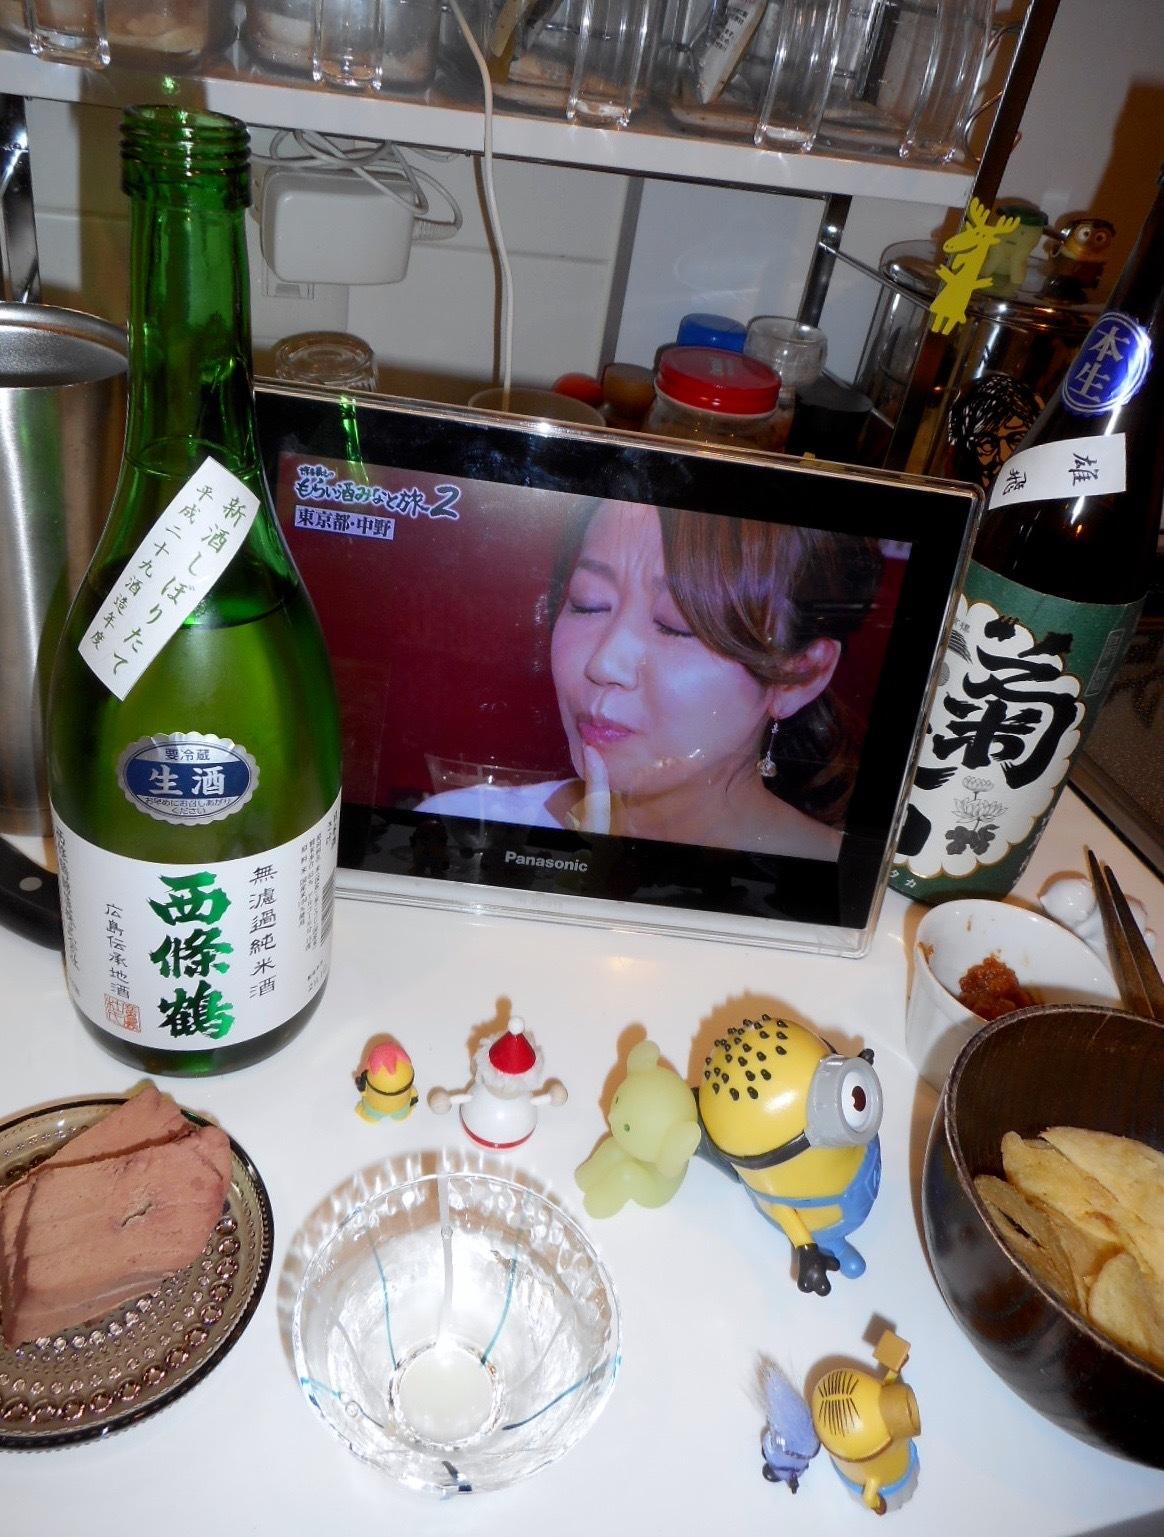 saijoutsuru_siboritate29by5.jpg